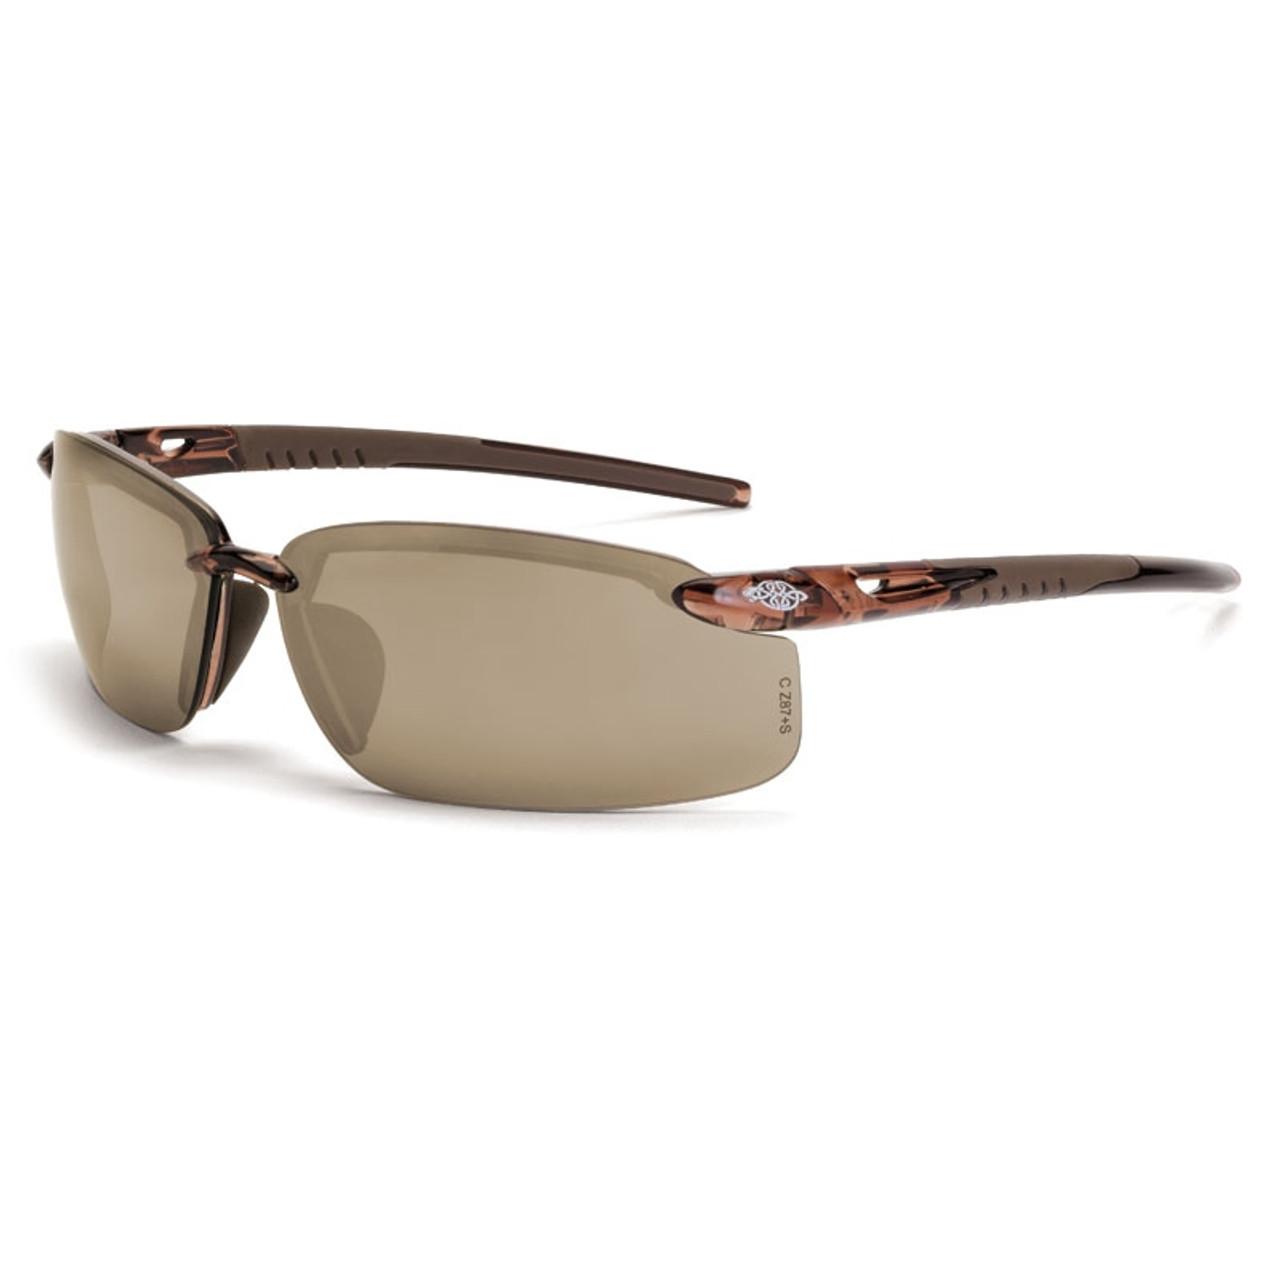 10bc58b816 Crossfire ES5 Bifocal Safety Glasses - Box of 12 - ES5-Readers